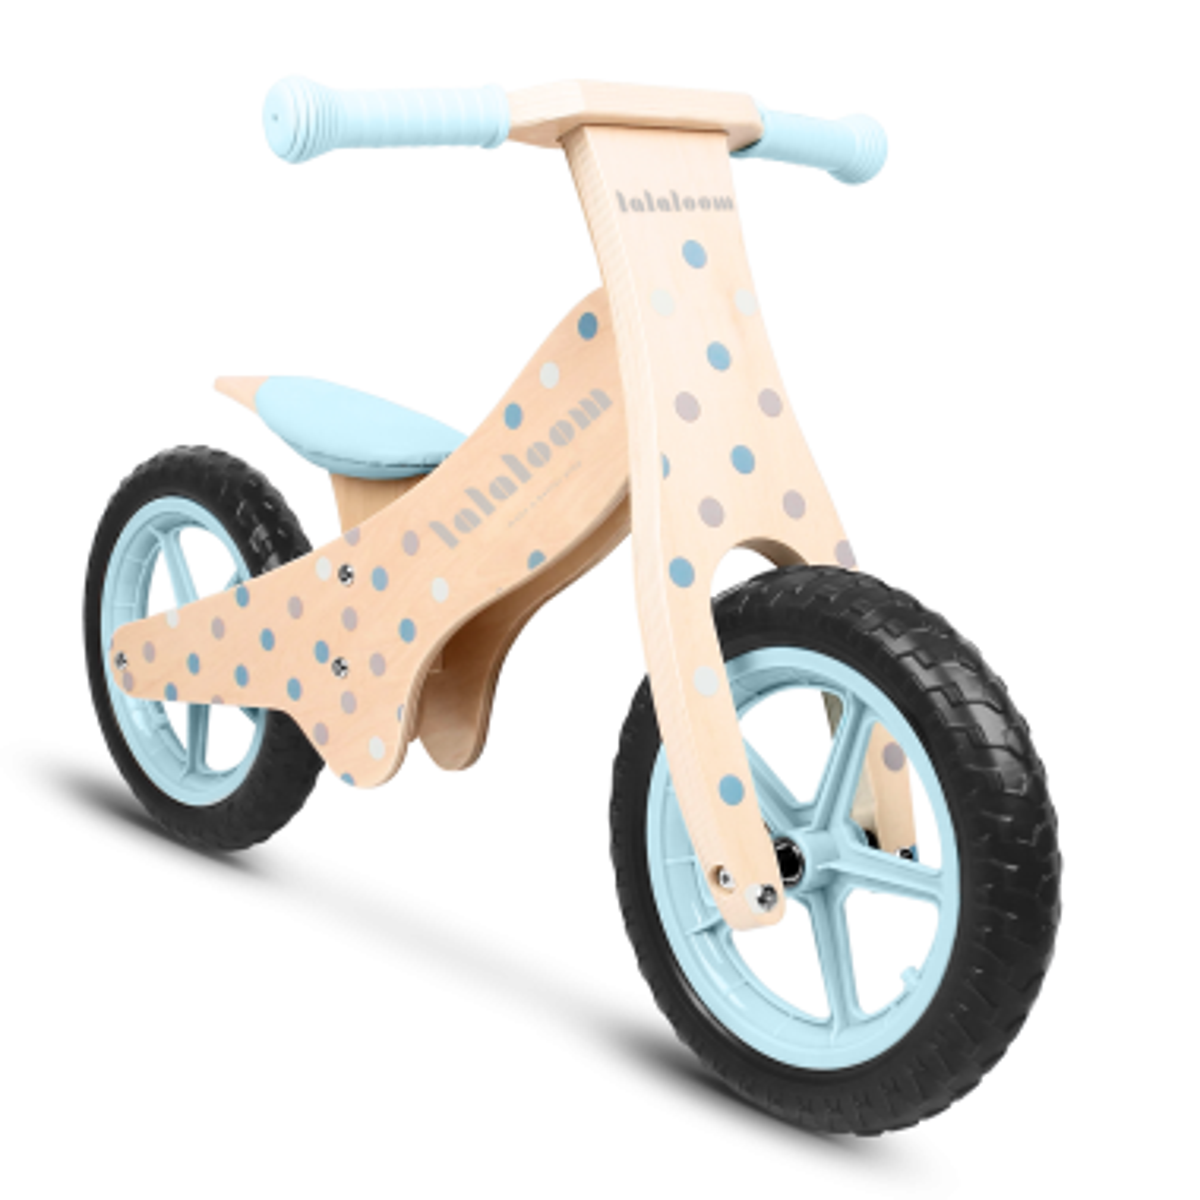 Bicicleta sin pedales BUBBLE BIKE como producto recomendado